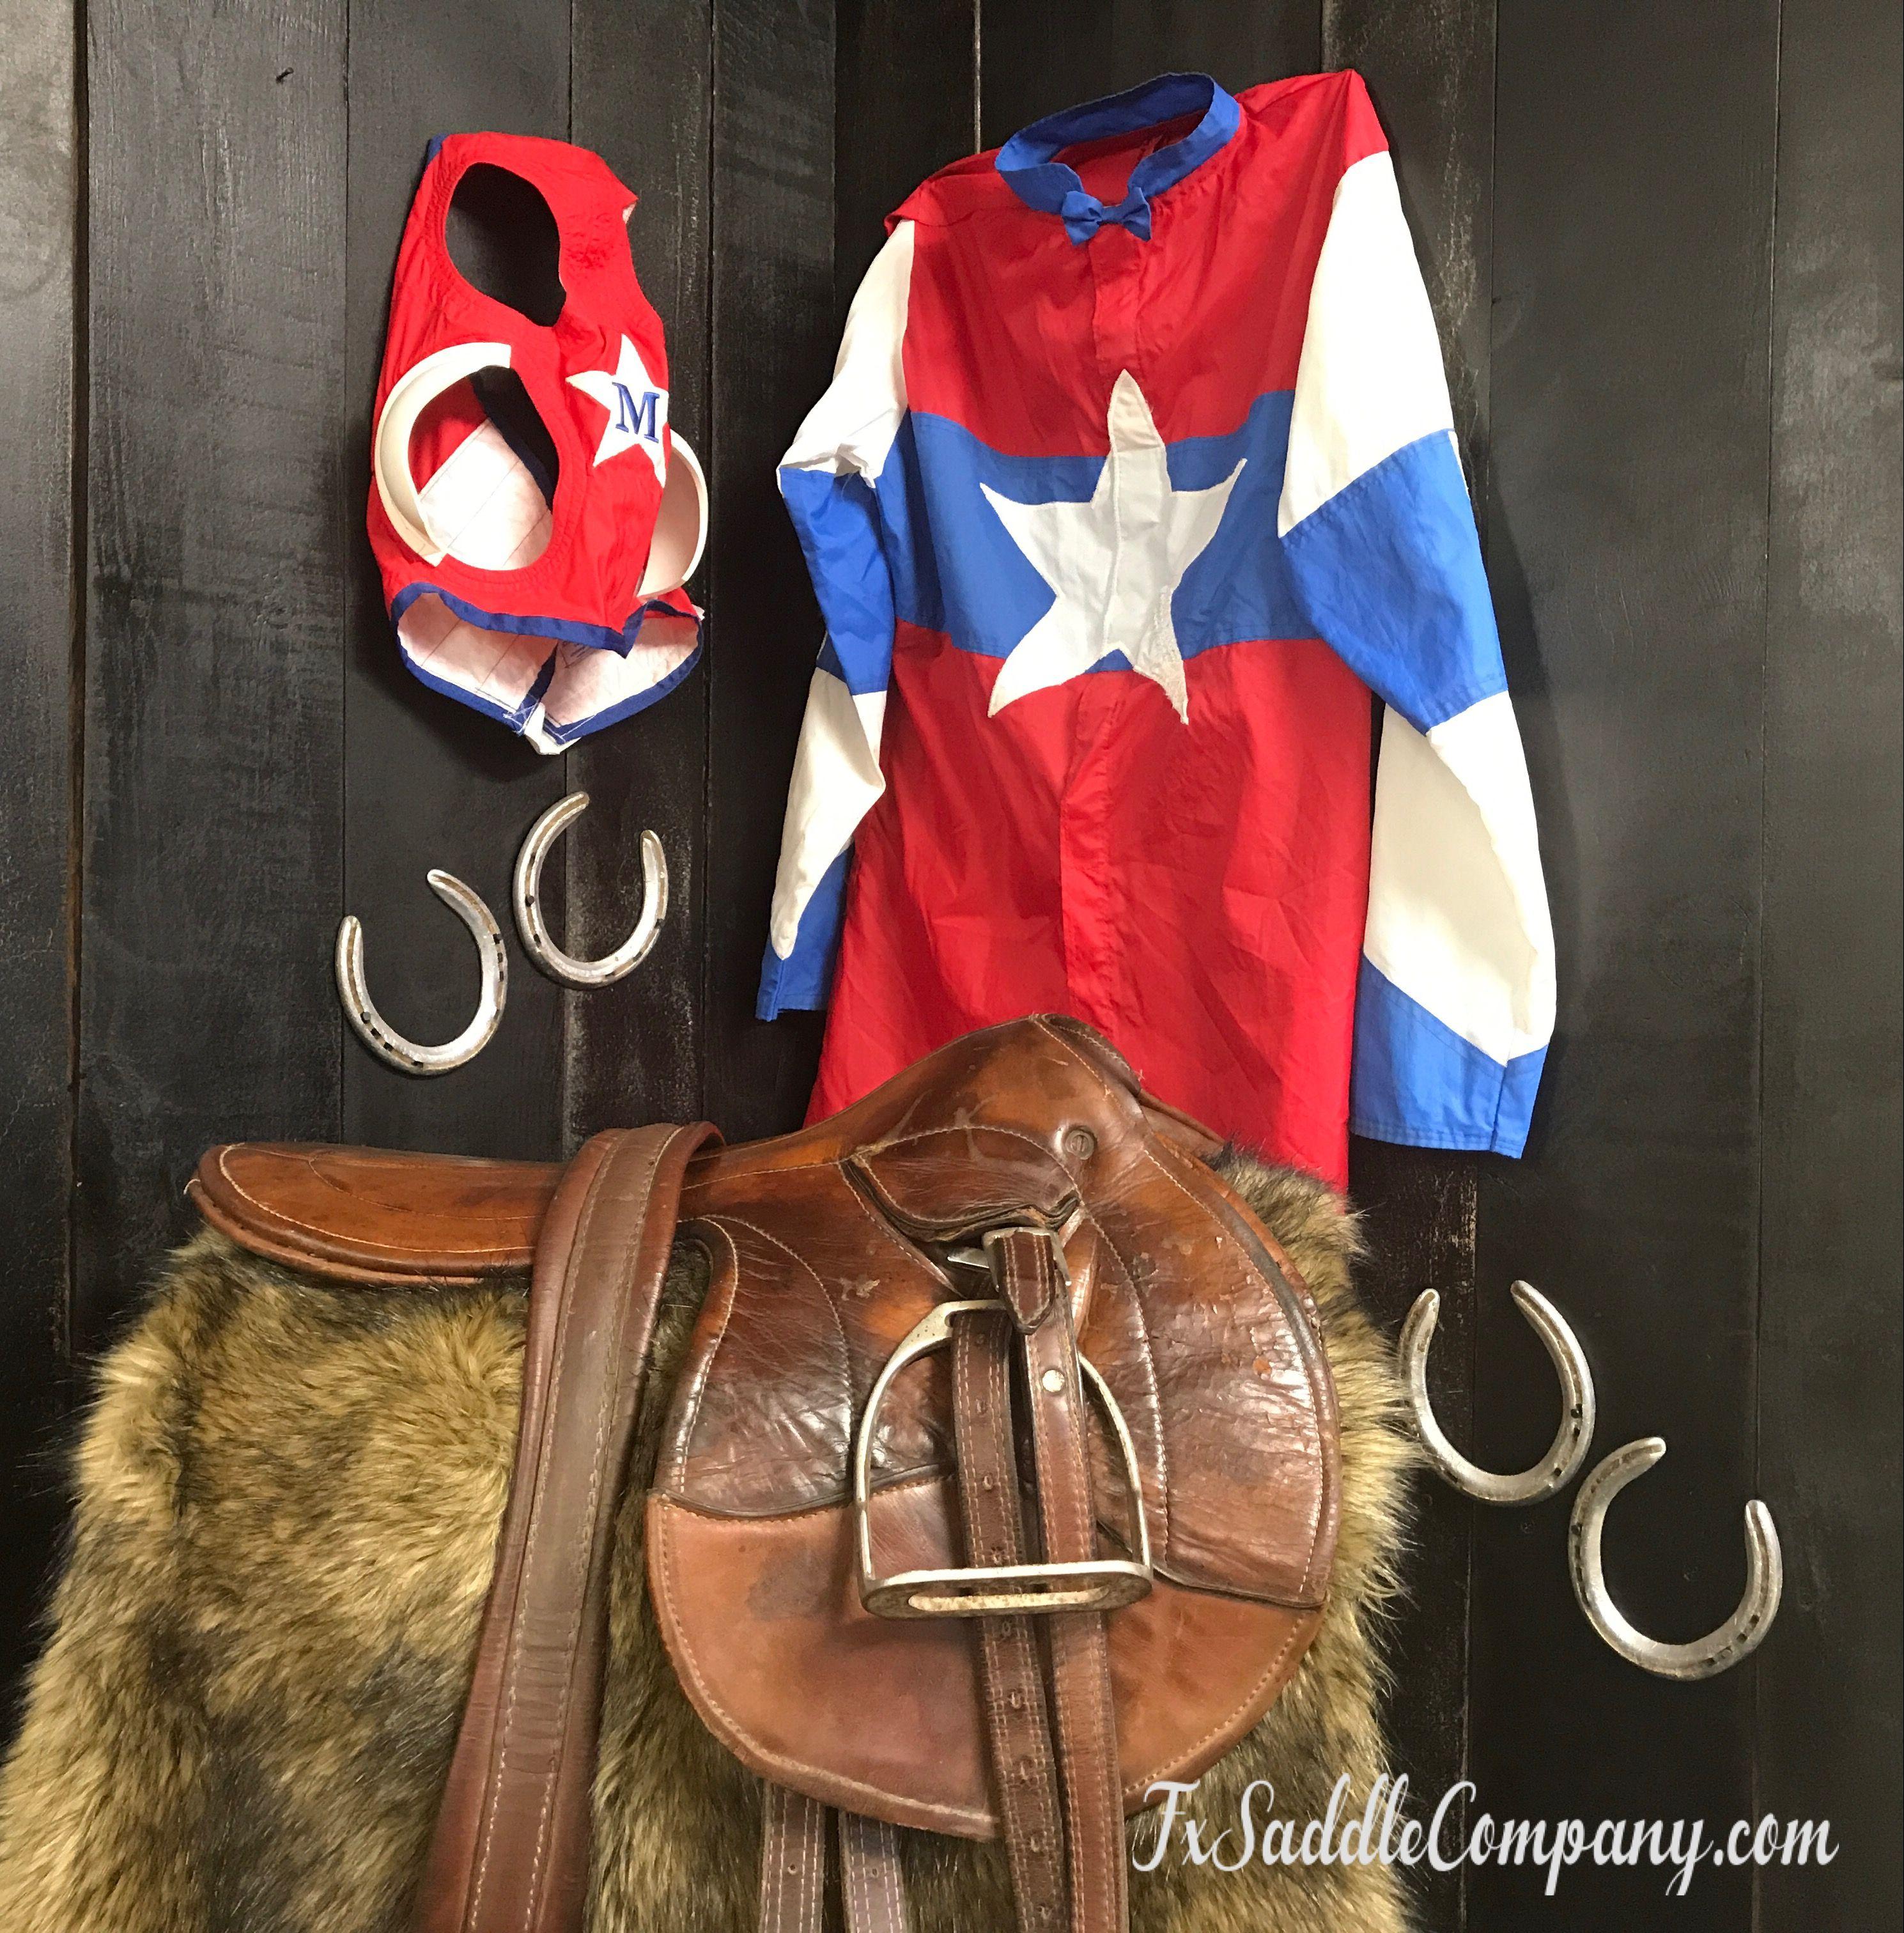 GENUINE CRATE LABEL FLORIDA RIDER JOCKEY VINTAGE HORSE RACING 1930S EQUESTRIAN